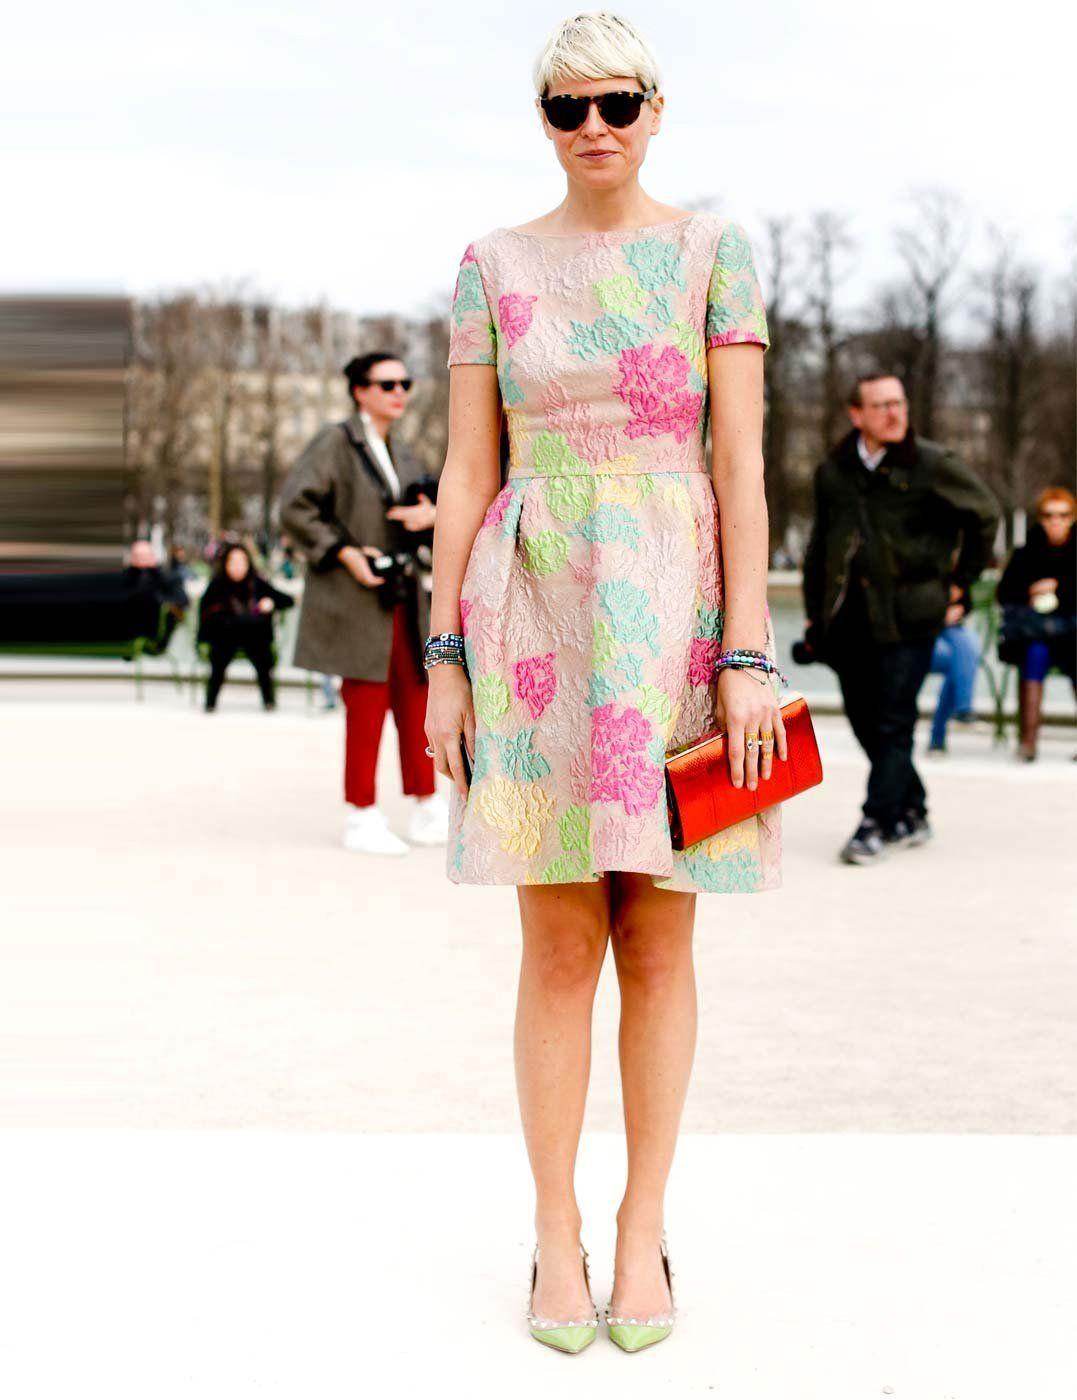 Wedding attendee dresses  Paris Fashion Week  Wedding Guest Fashion  Pinterest  Elisa nalin